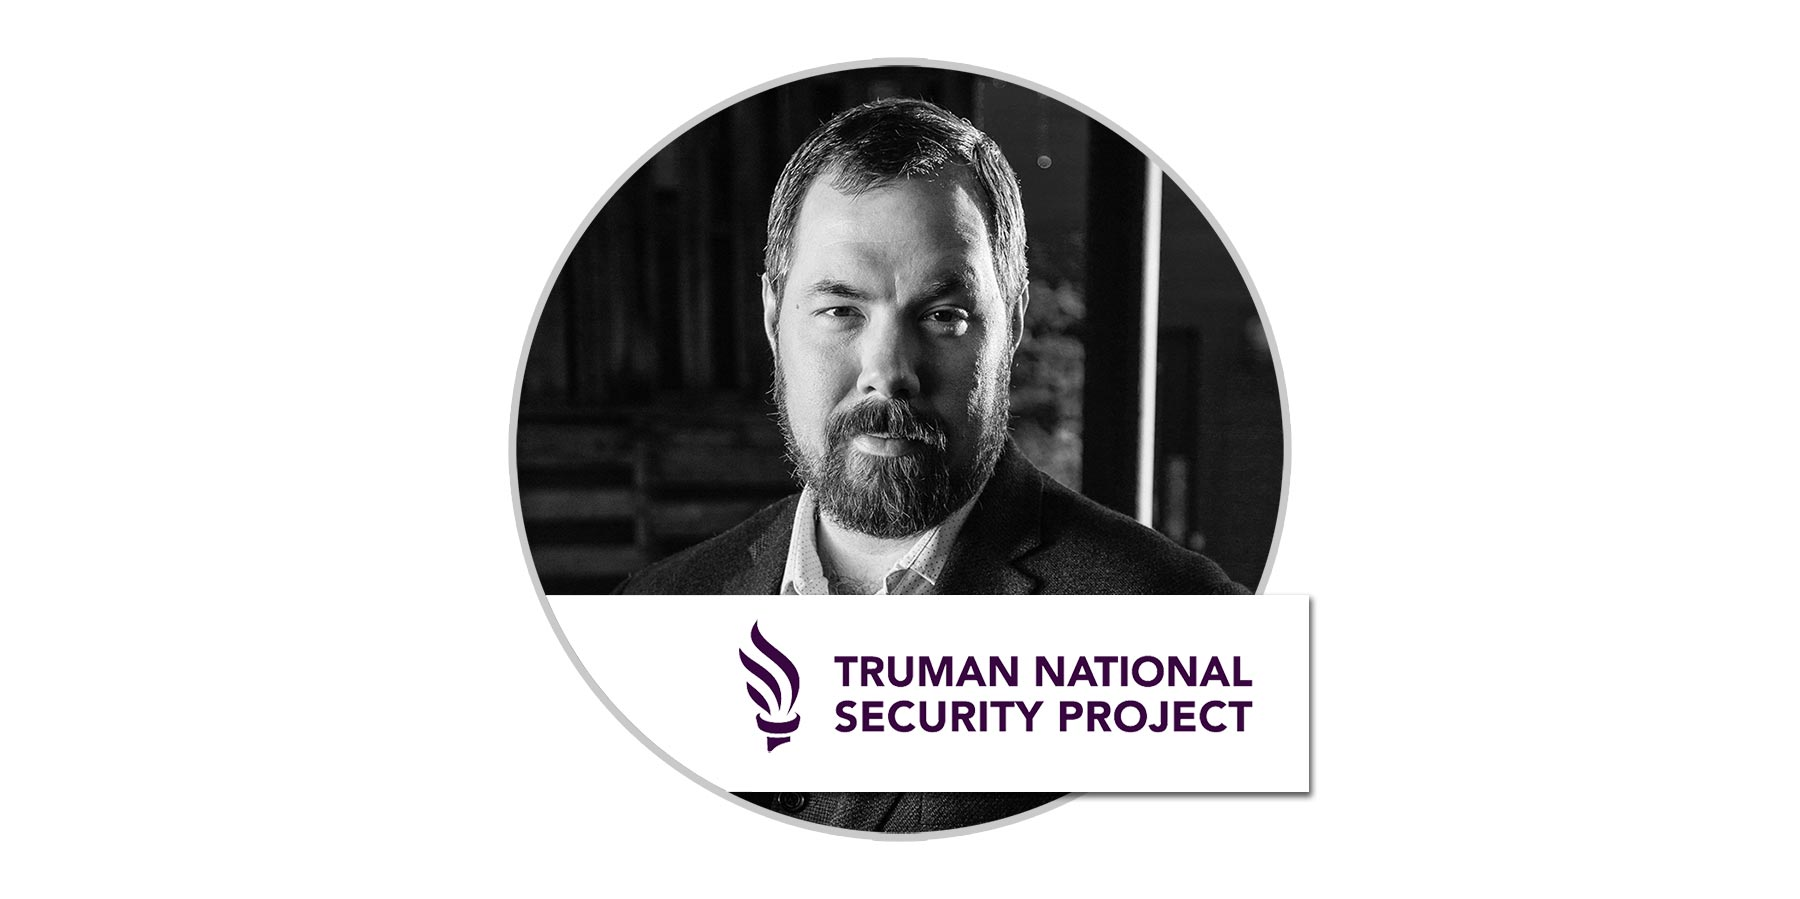 Josh Berthume, Truman National Security Project logo